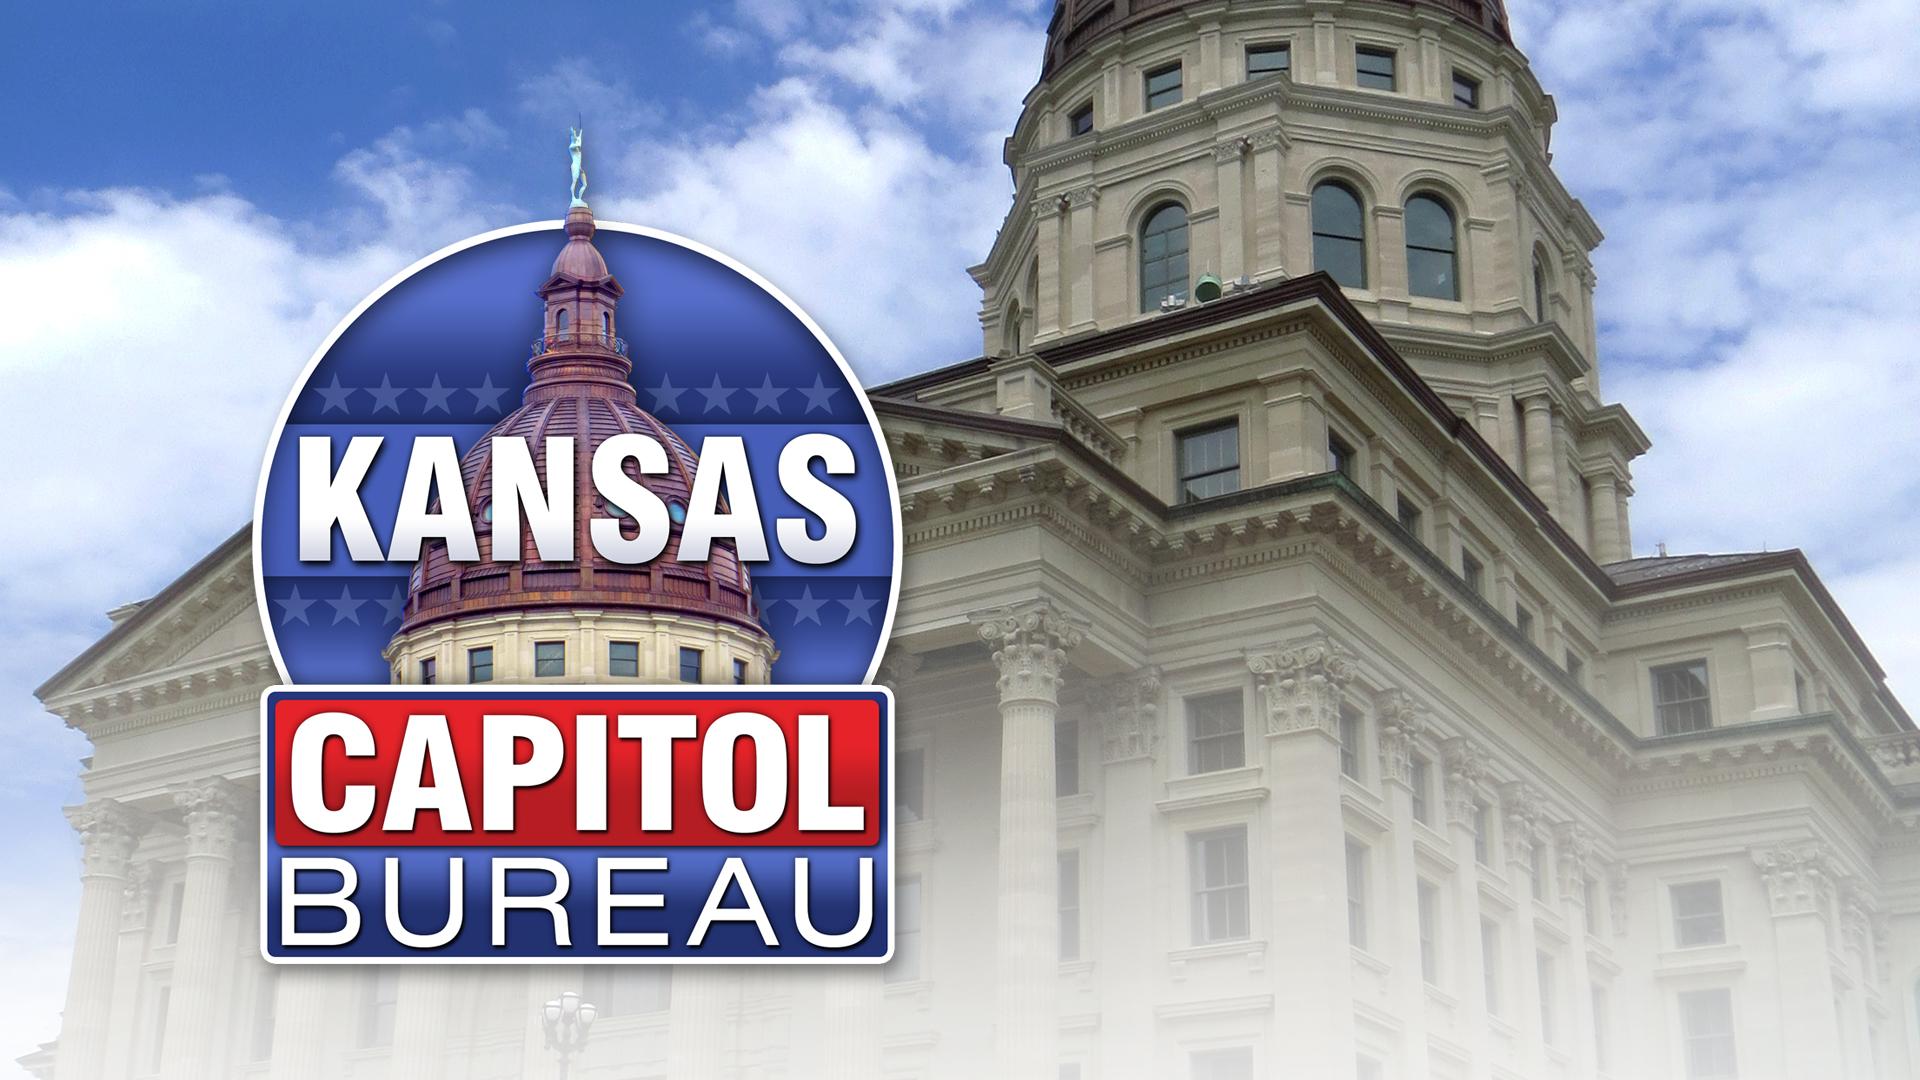 Kansas Capitol Bureau FSG Left_387602